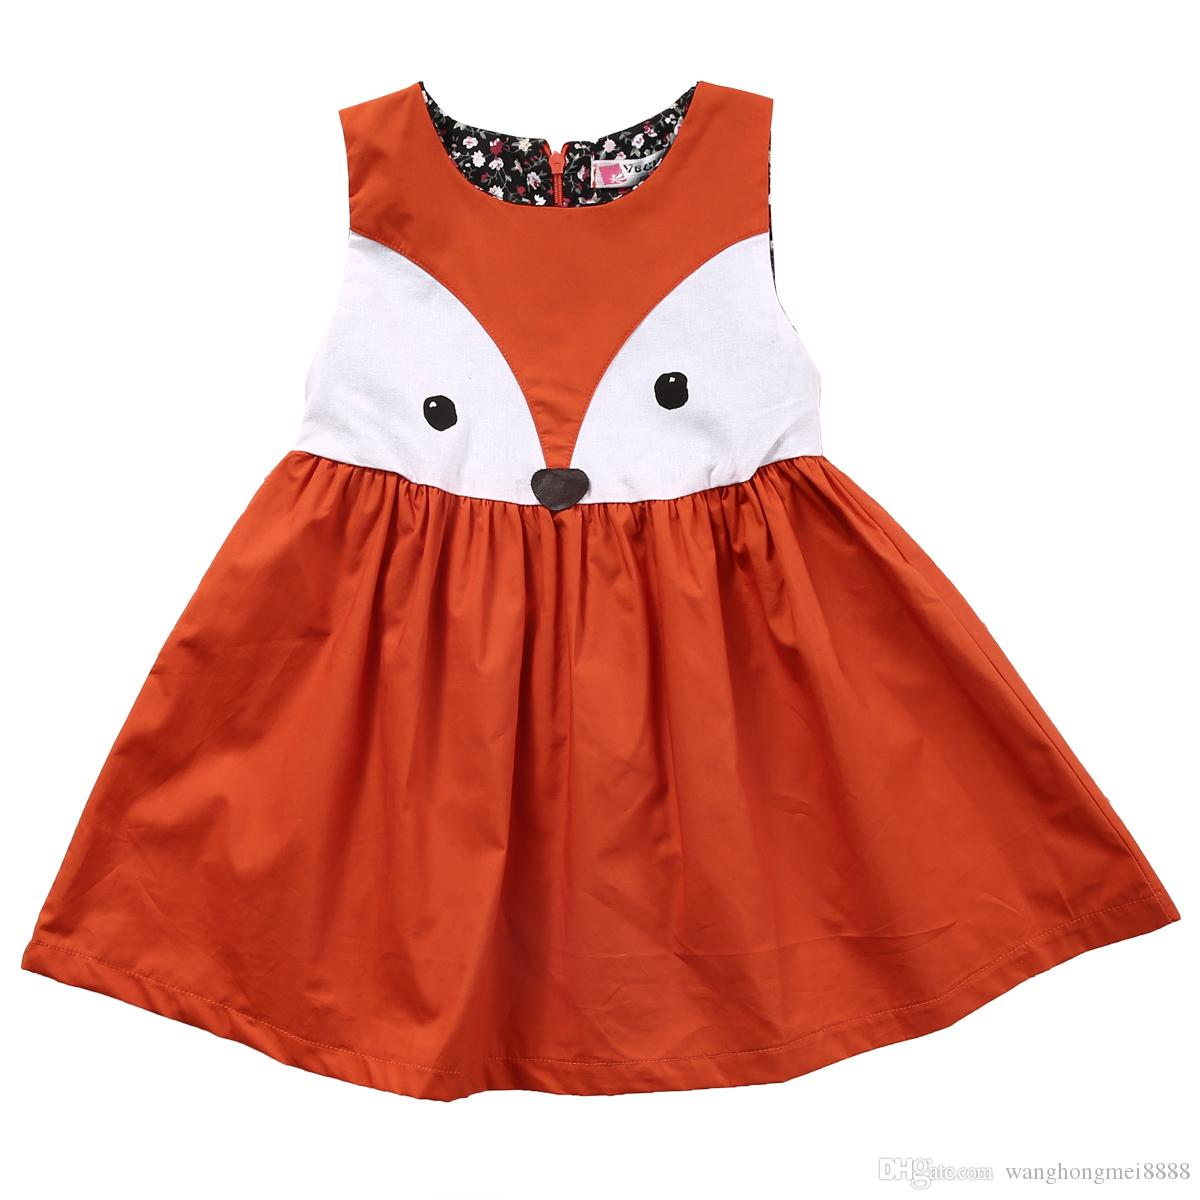 Summer Casual Baby Girls Toddler Kids printed cartoon Fox Dress Formal Party Wedding Tutu sleeveless Dress for girls